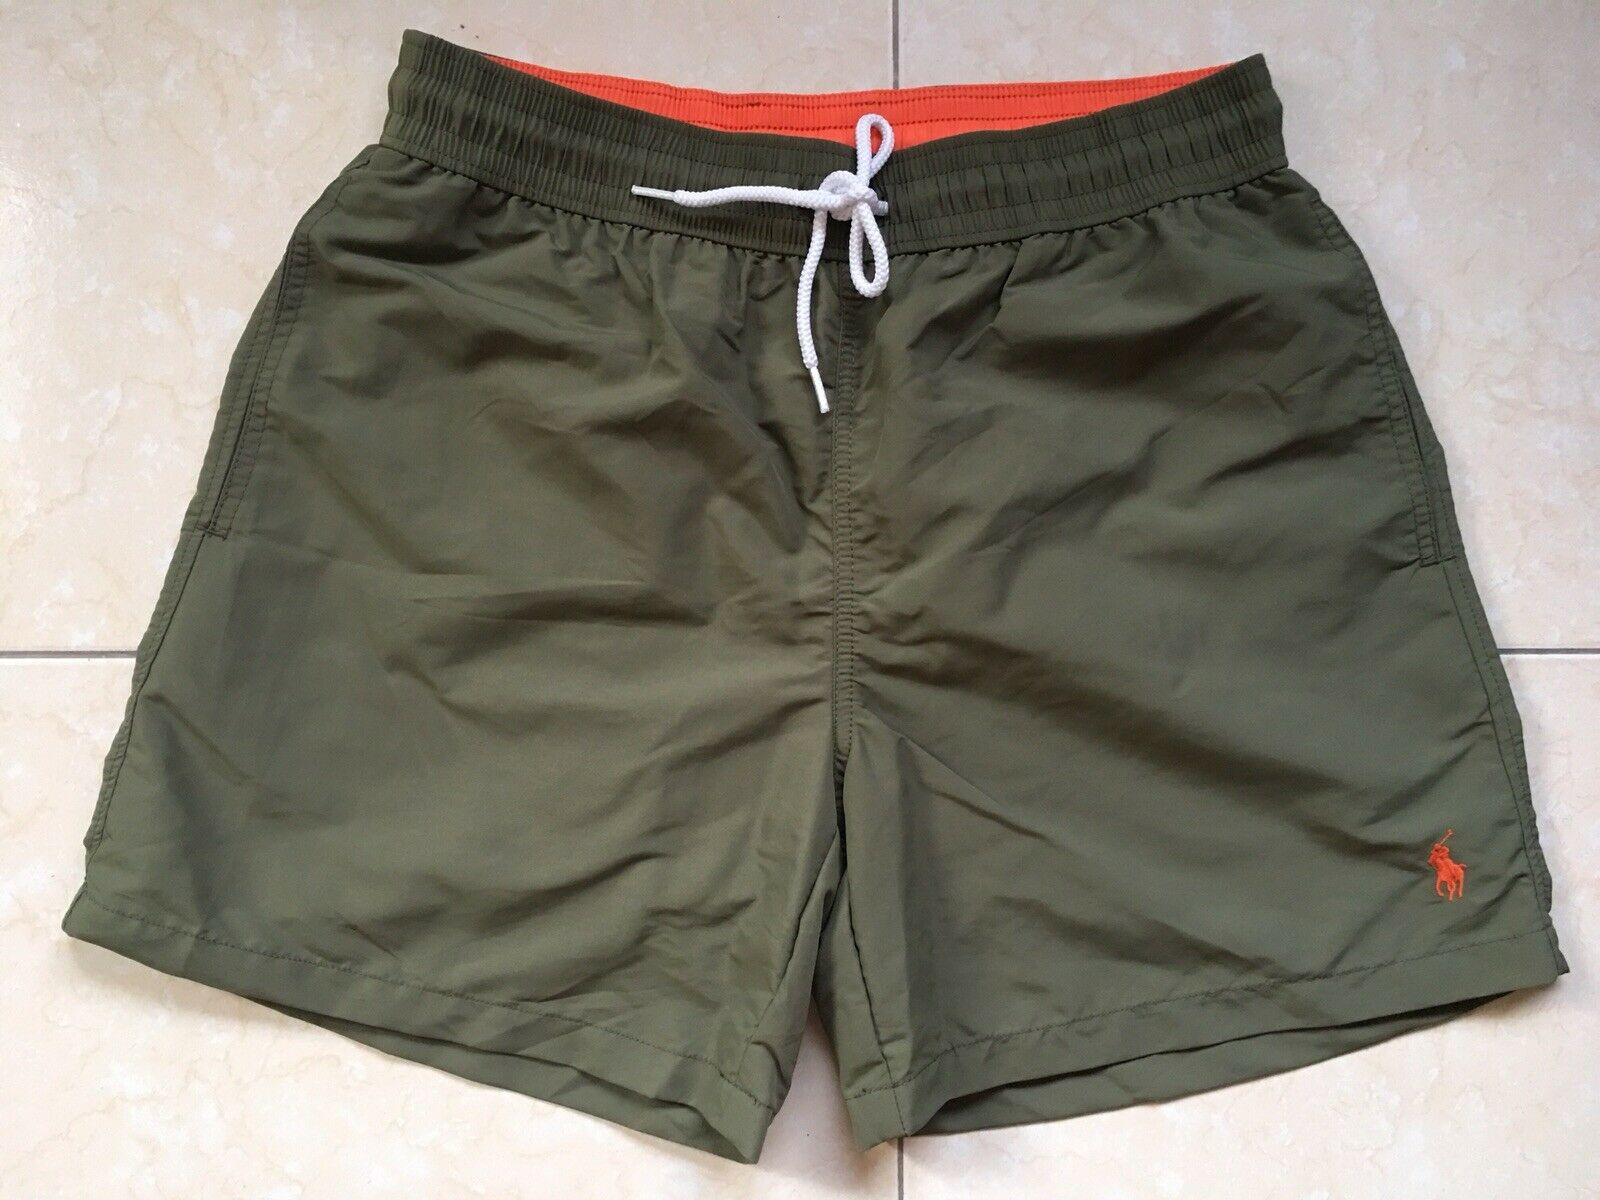 Polo Ralph Lauren Swim Shorts Traveler Trunk Olive Size XS, M or XL